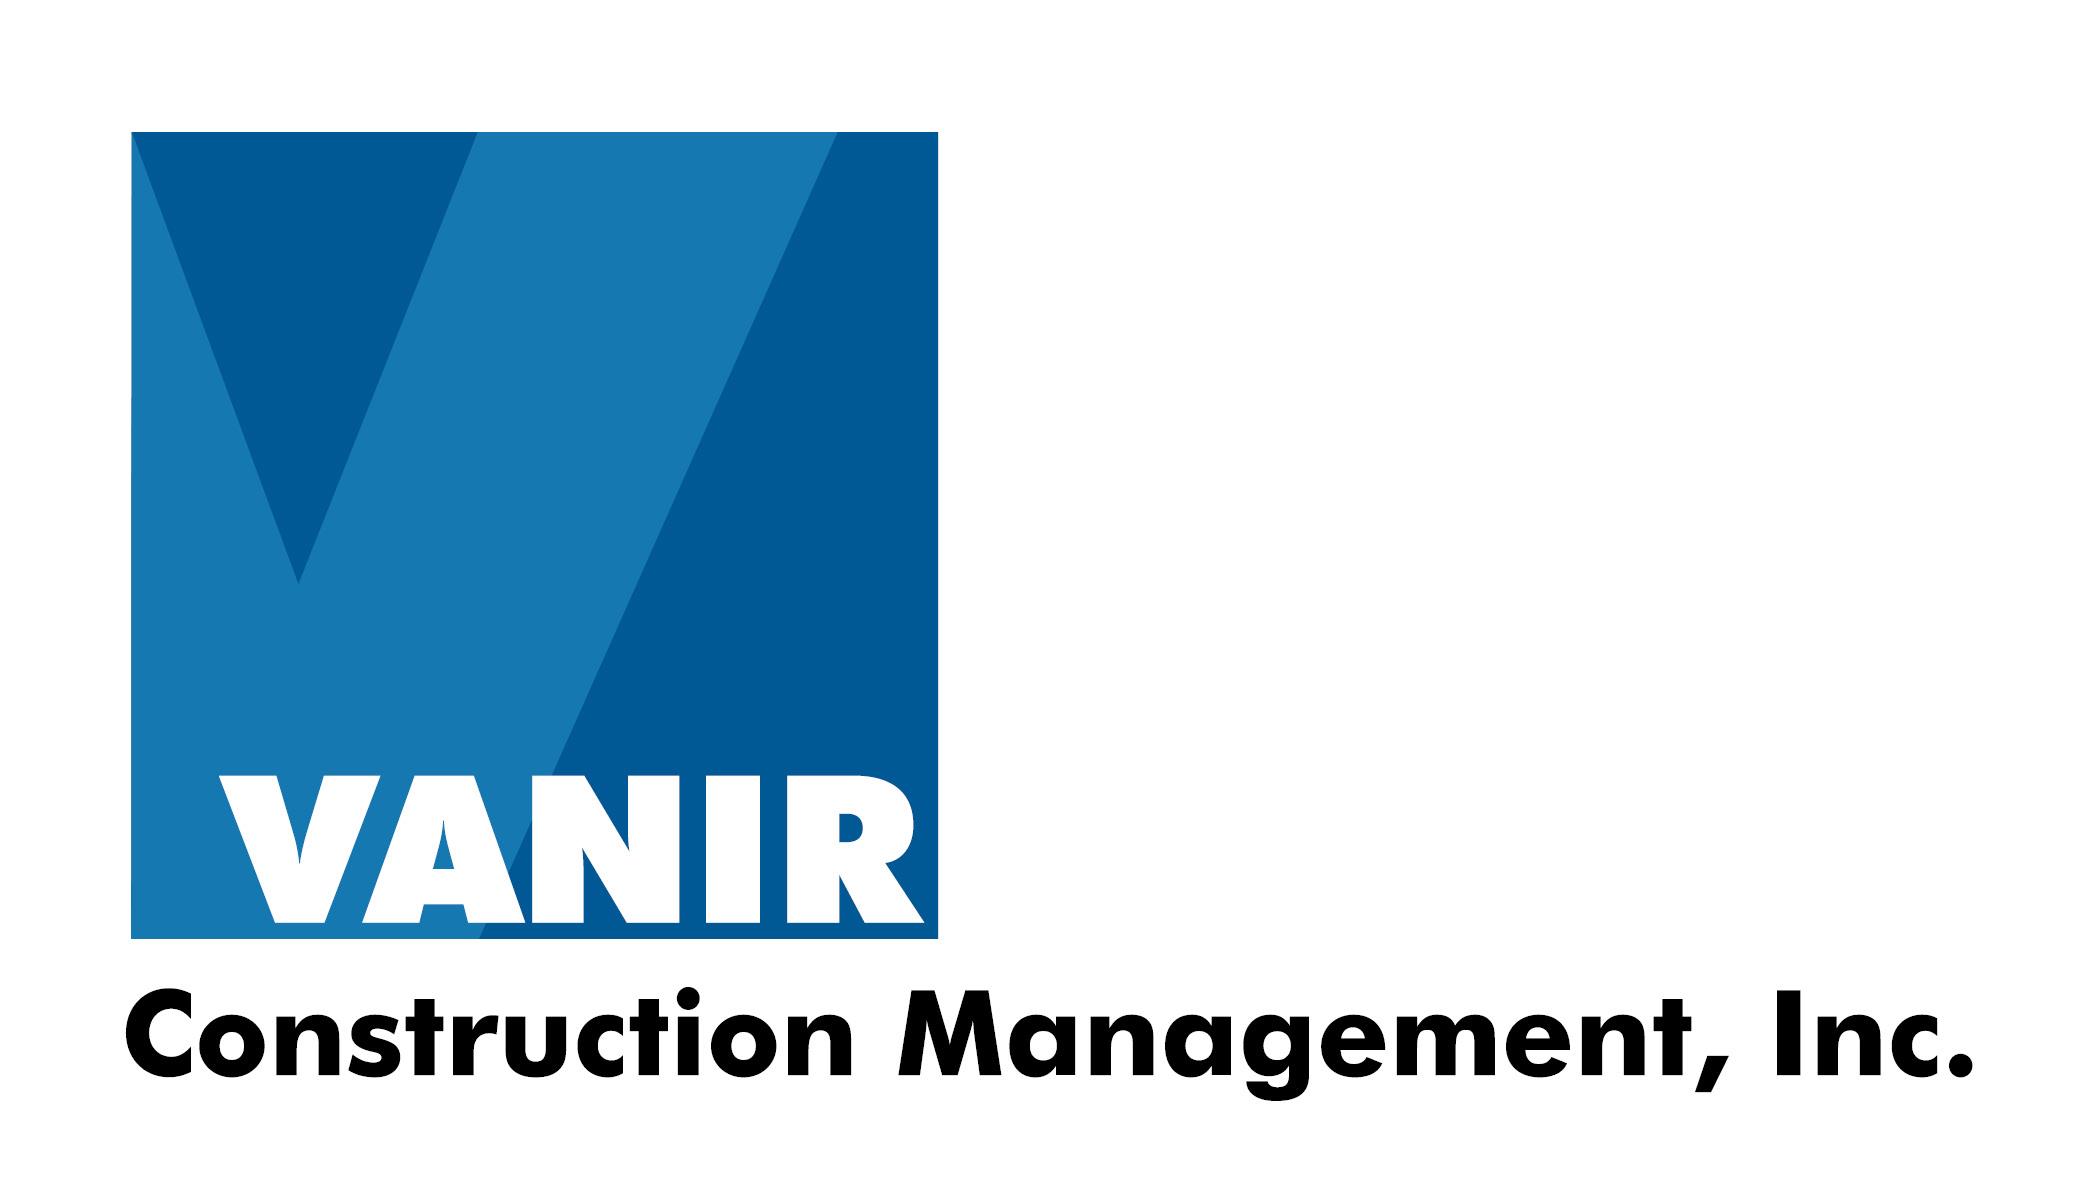 Vanir Construction Management, Inc